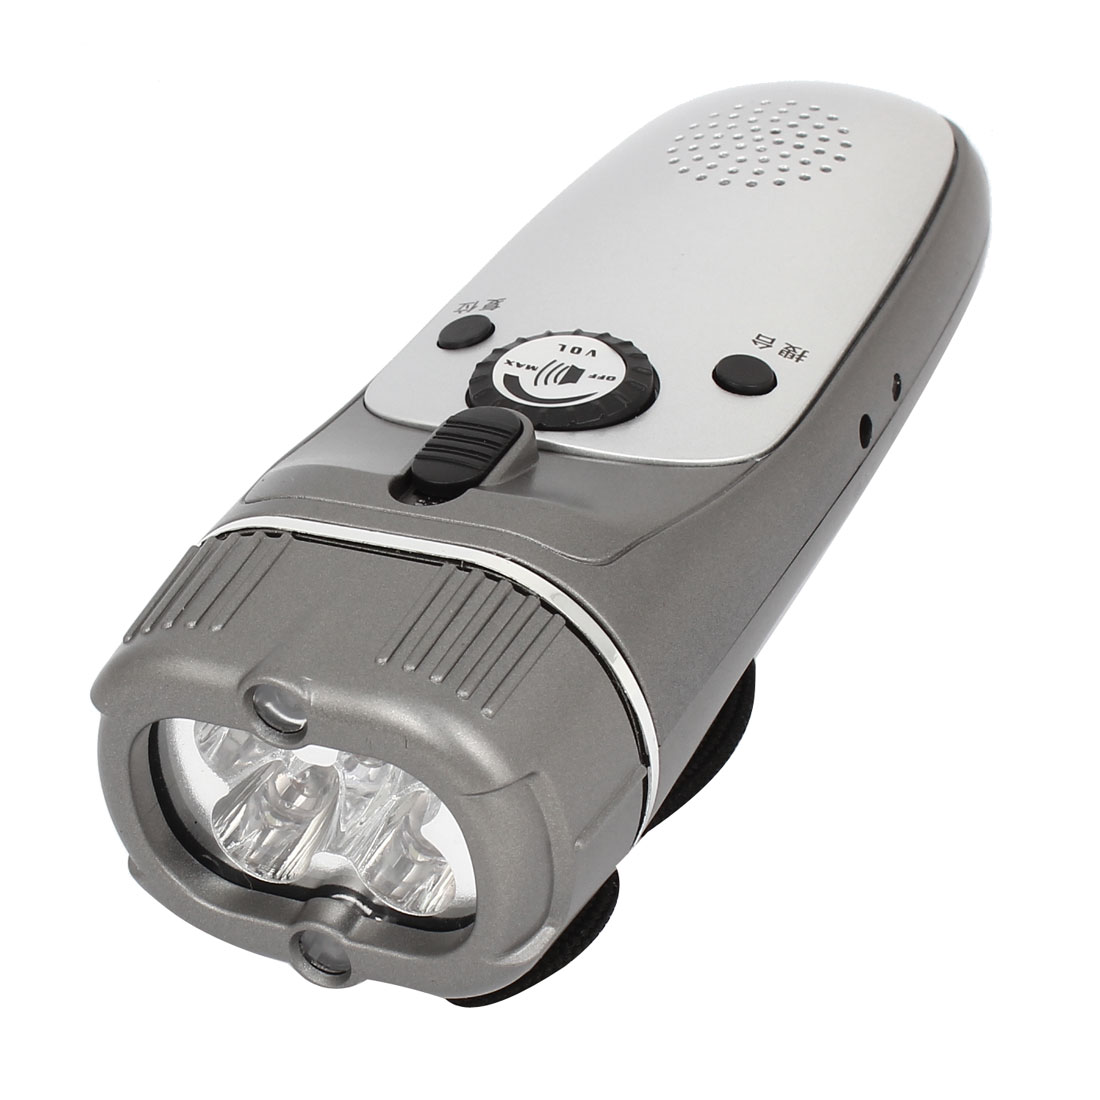 Outdoor Hand Crank FM Radio White Light LED Torch Flashlight